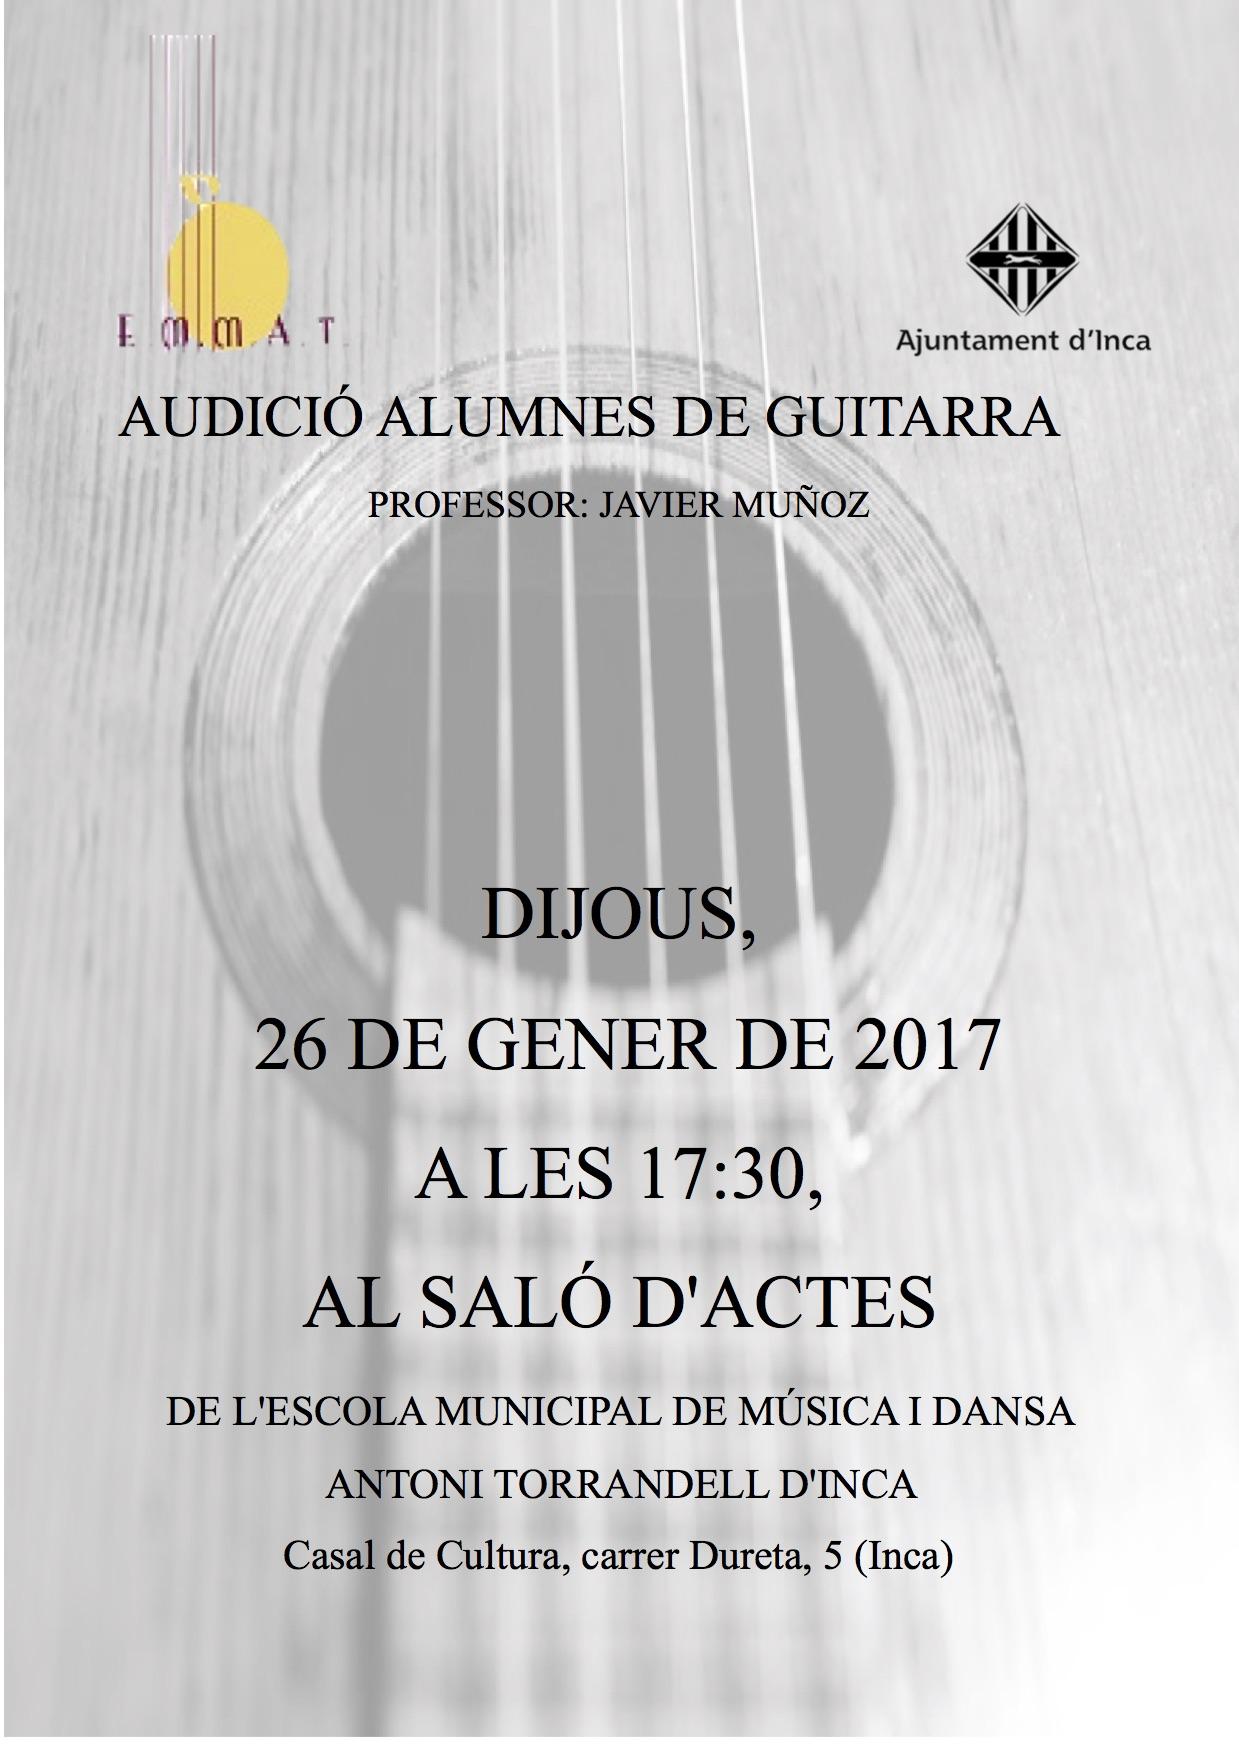 AUDICiO DE GUITARRA gener 2017